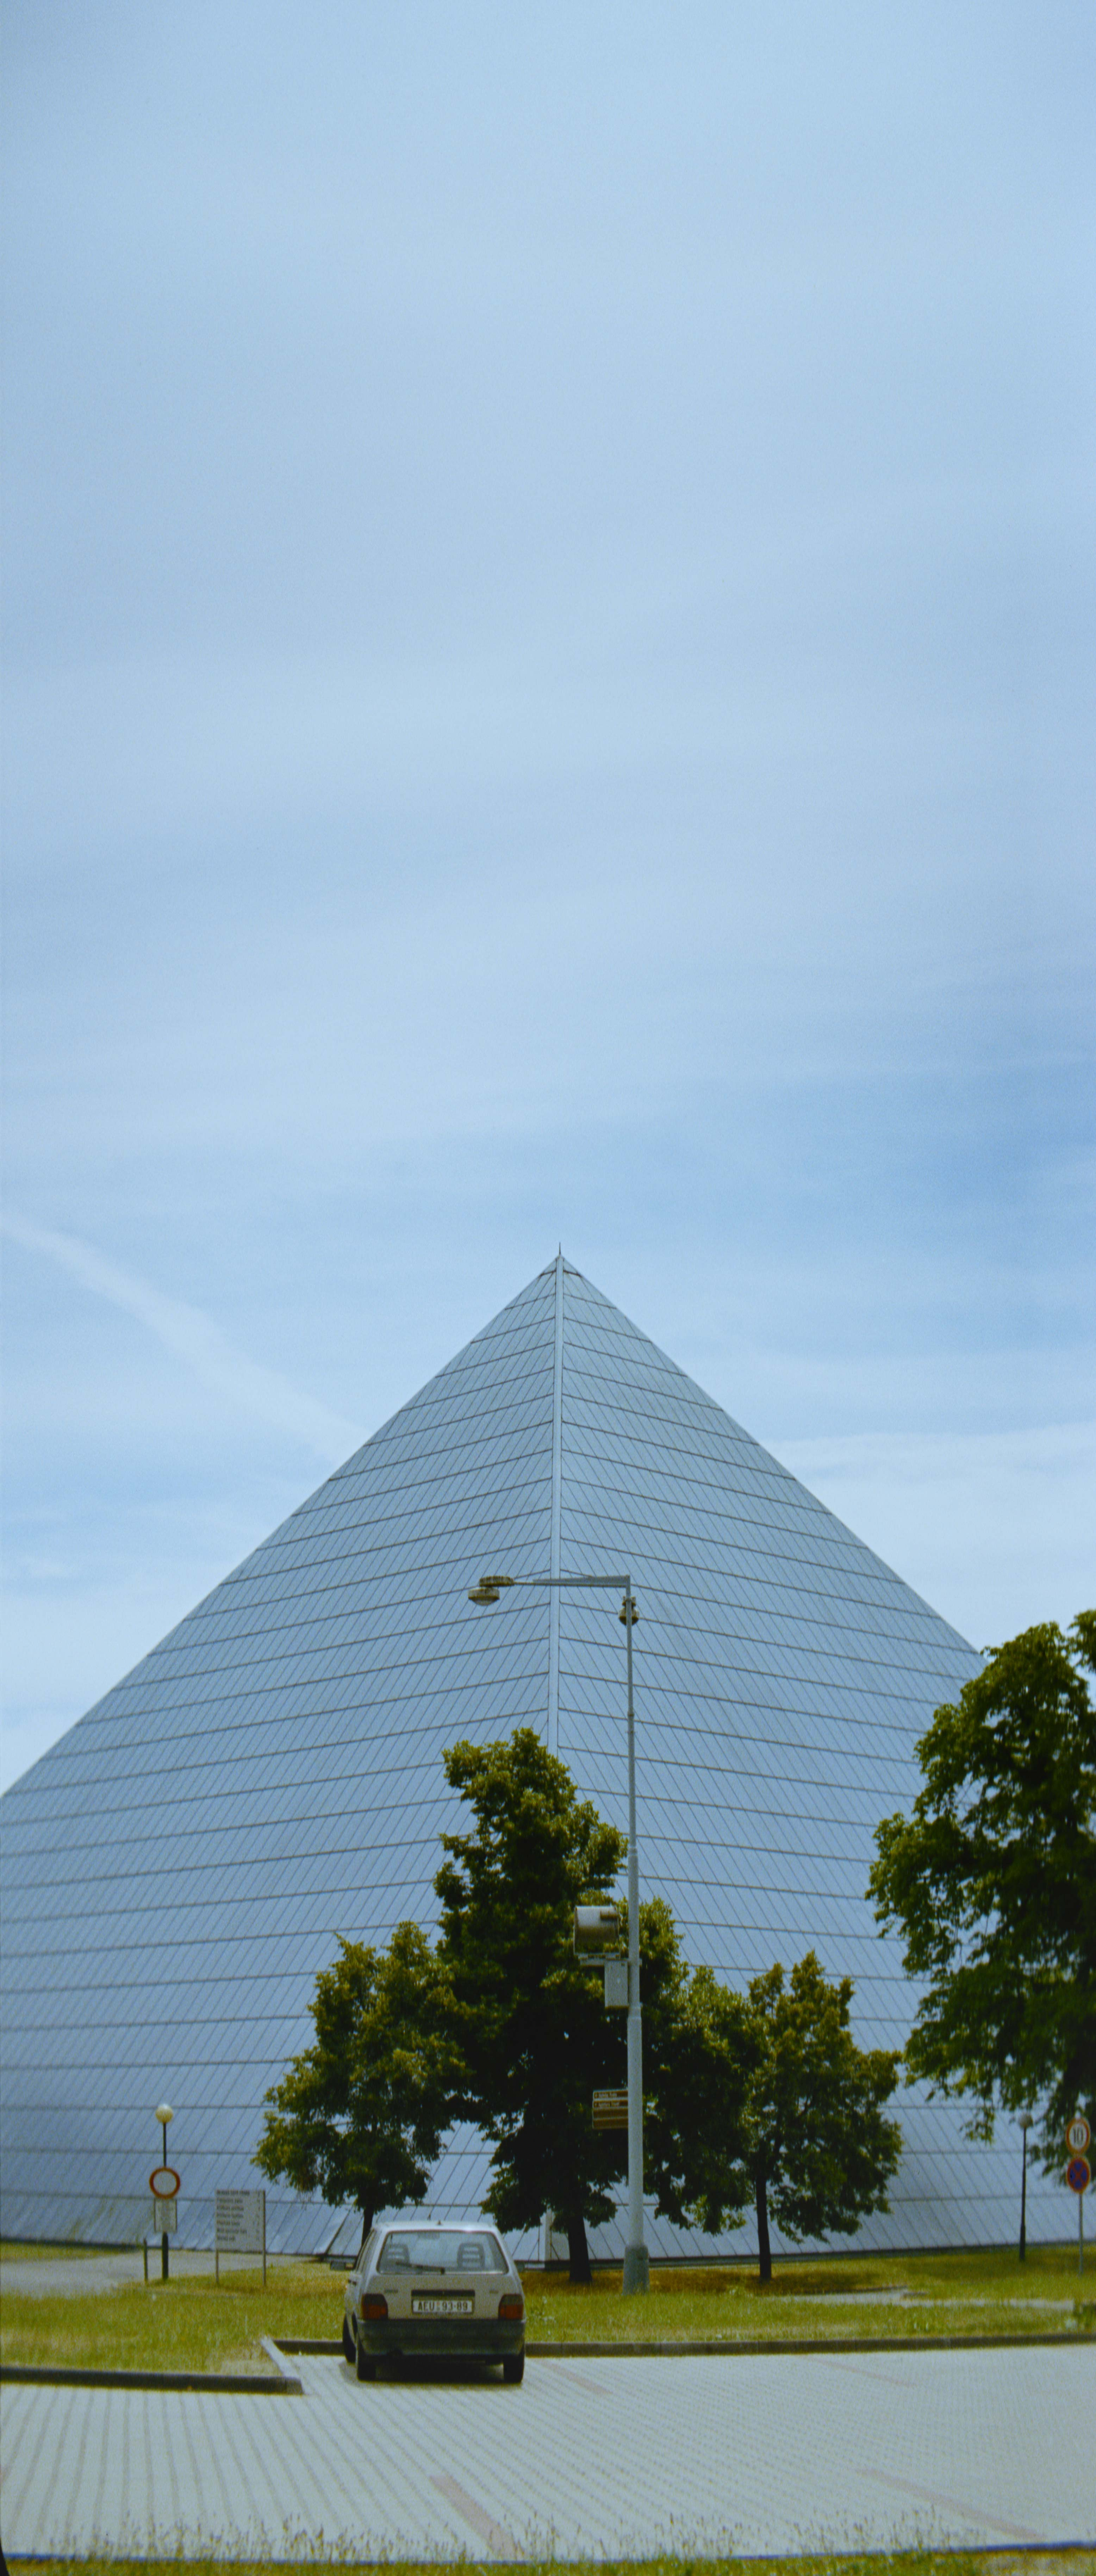 Johann Lurf - Picture Perfect Pyramid